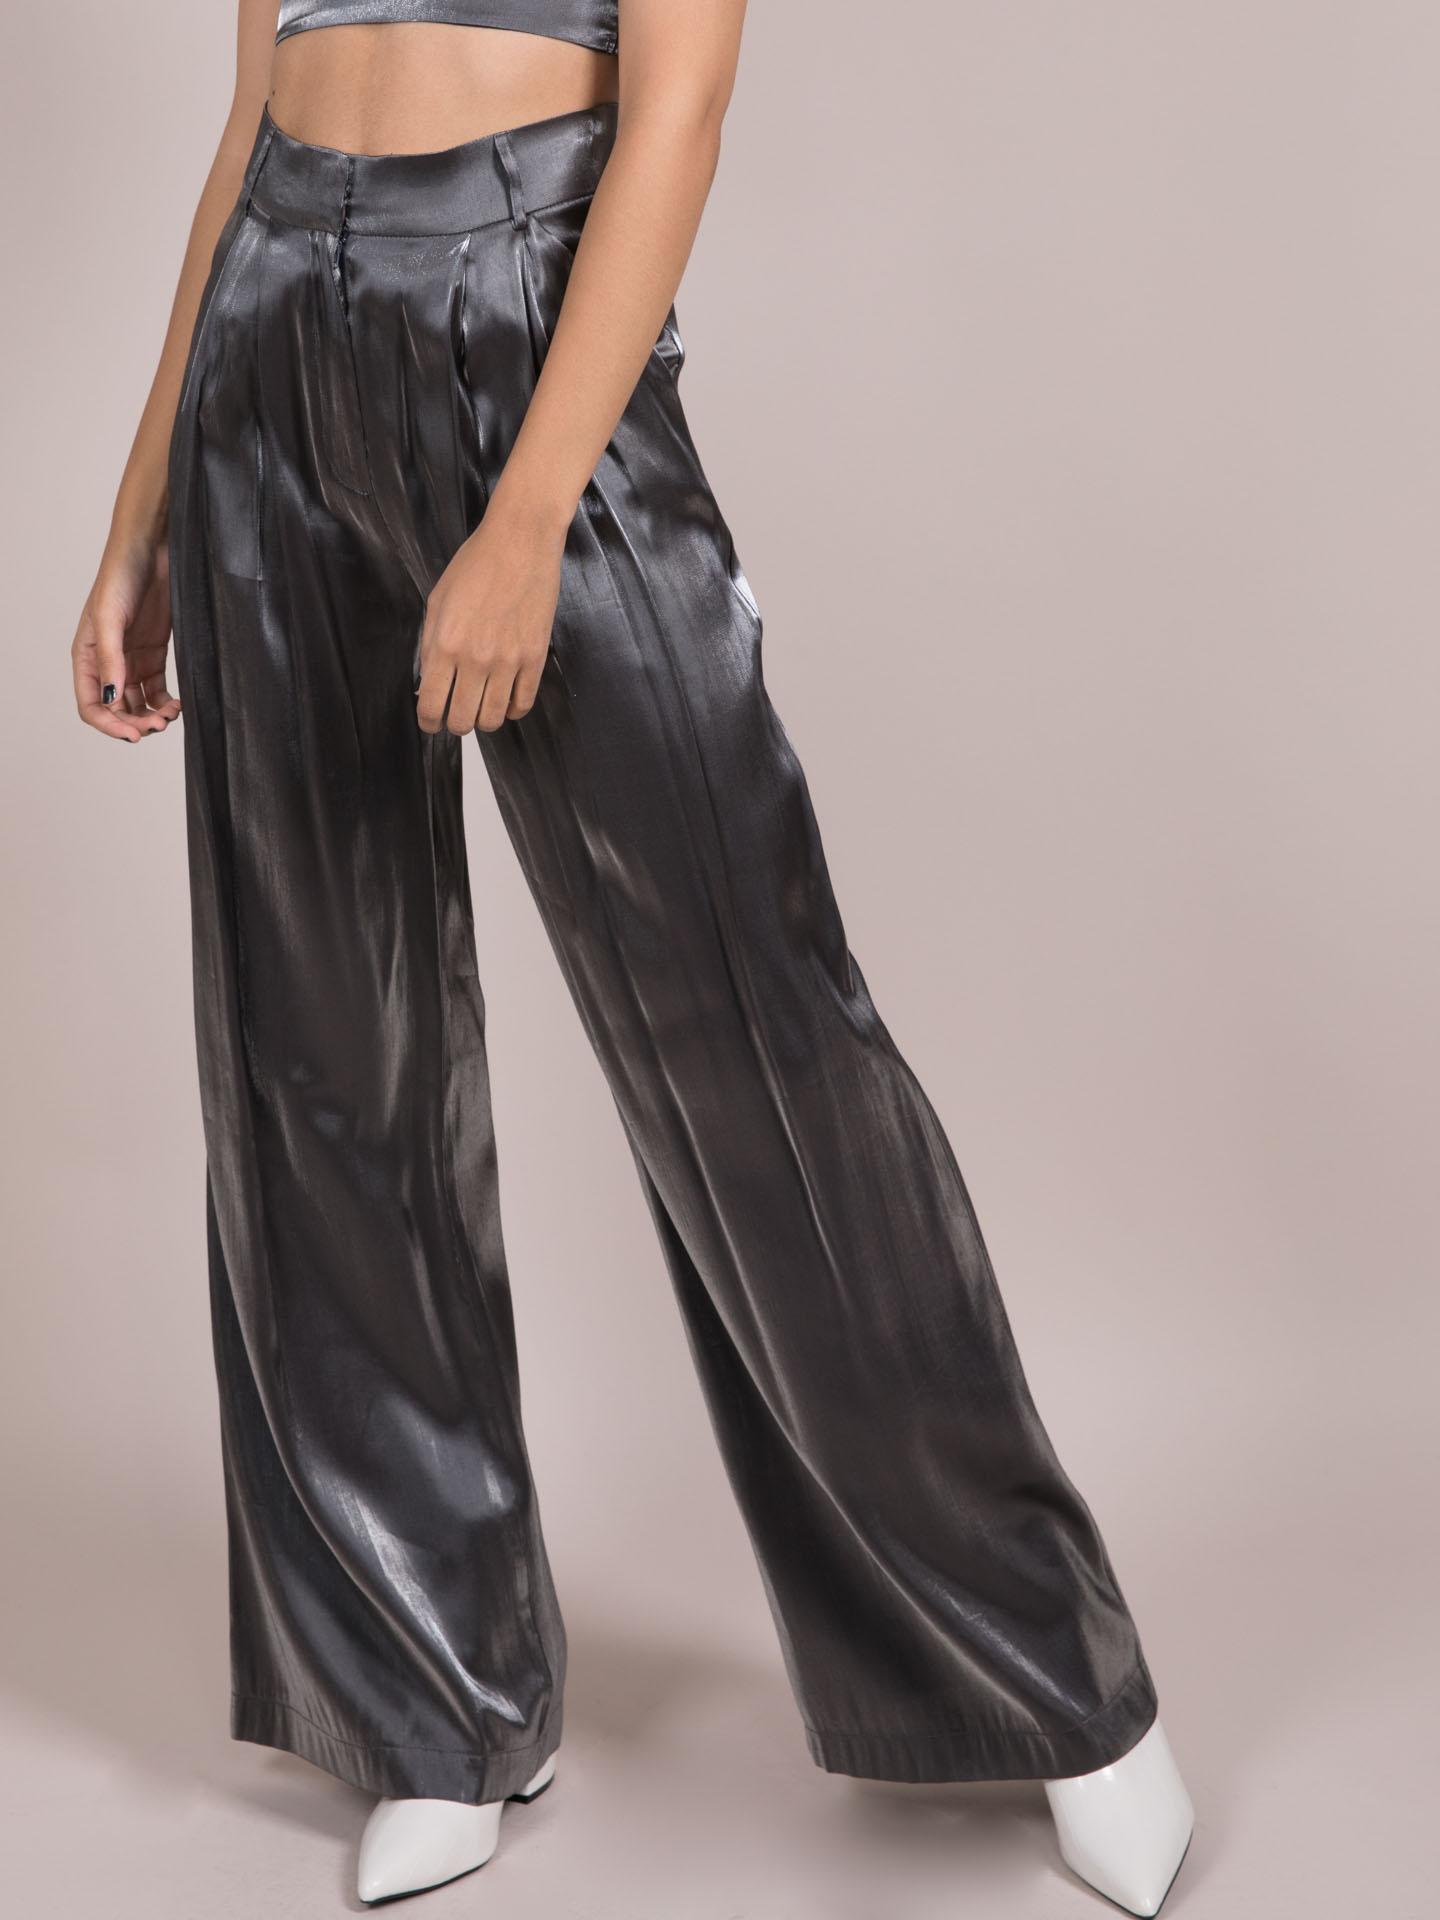 Noa Metallic Pants  Silver Wide Legged Bottoms Front